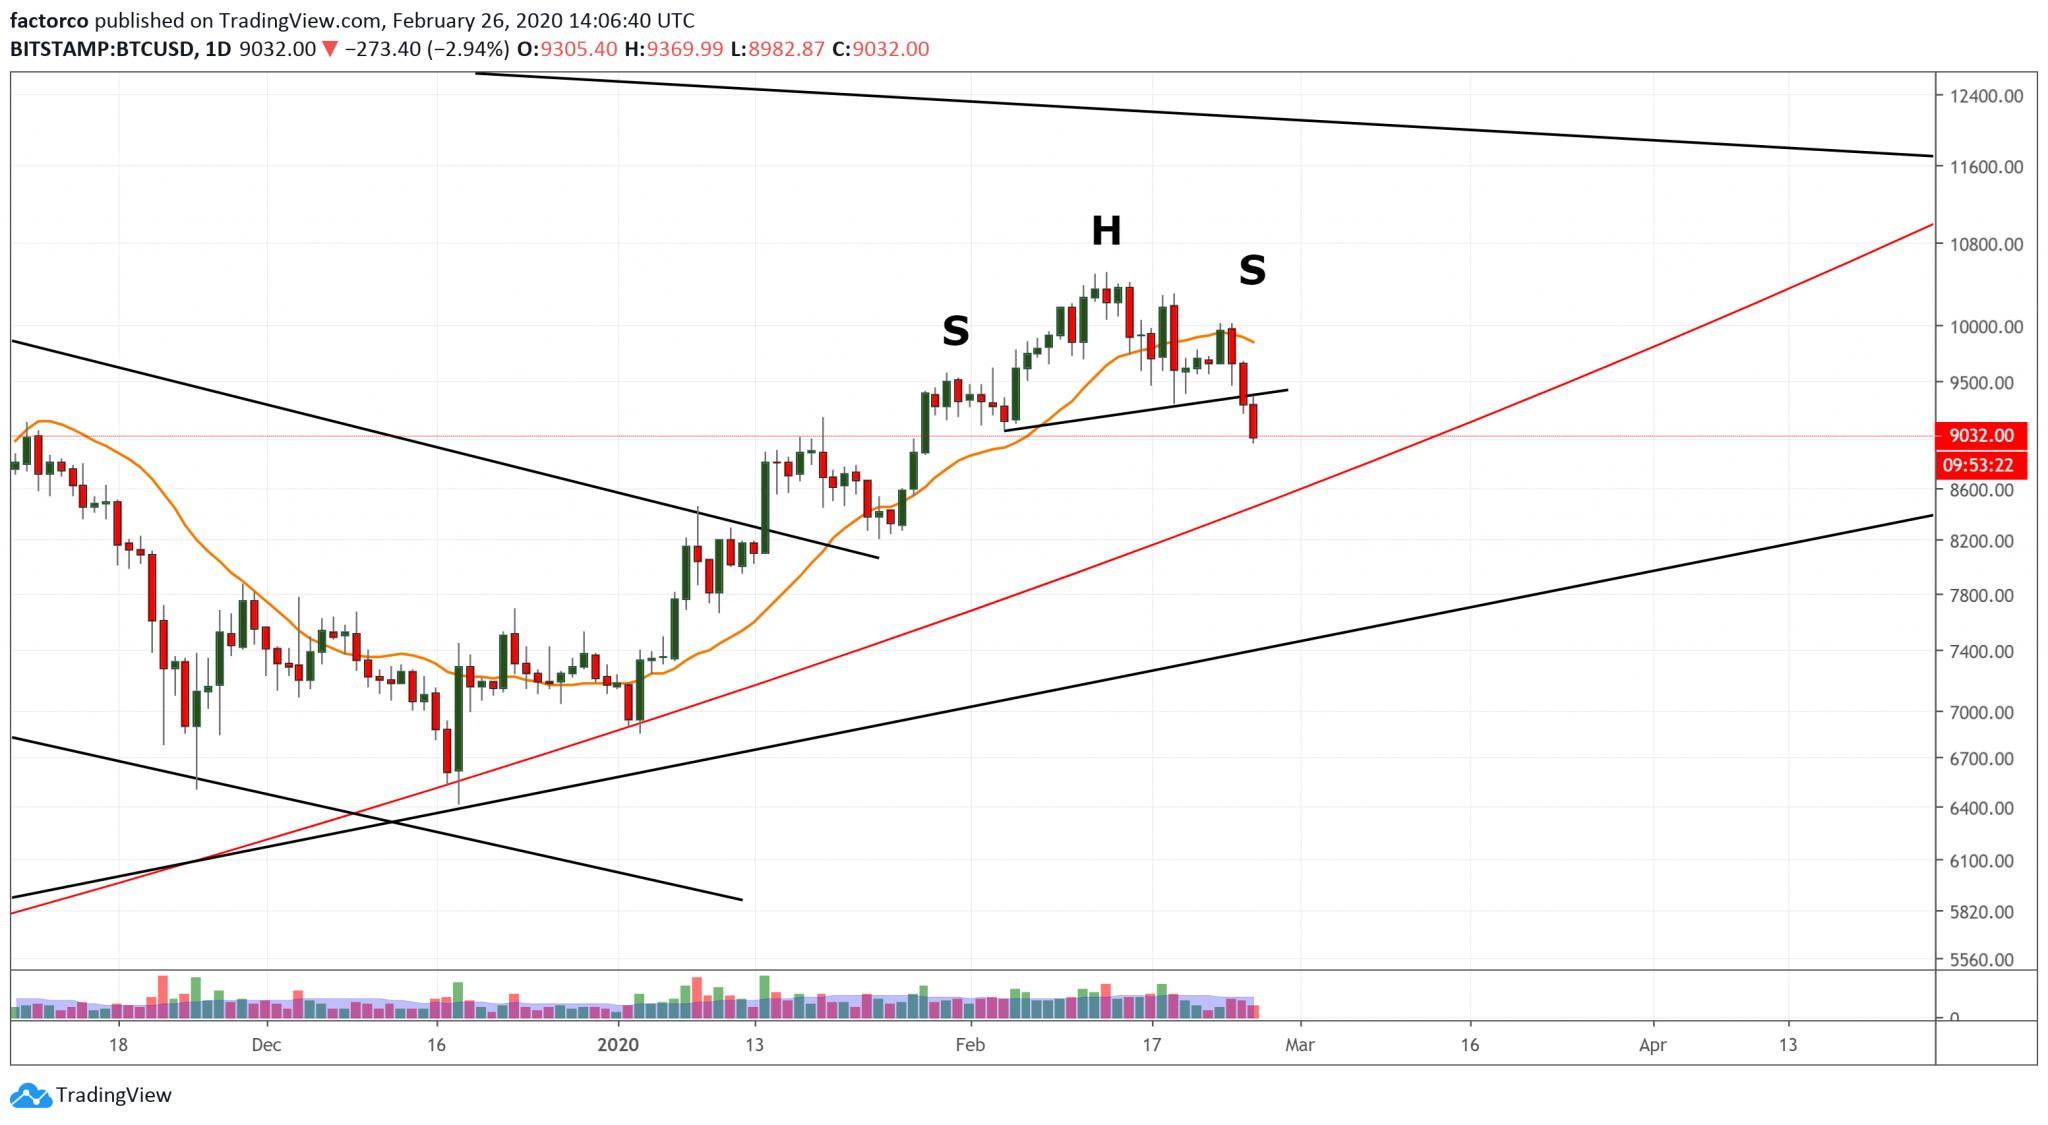 Bitcoin in precarious position as Dow Jones enters correction territory on Coronavirus fears